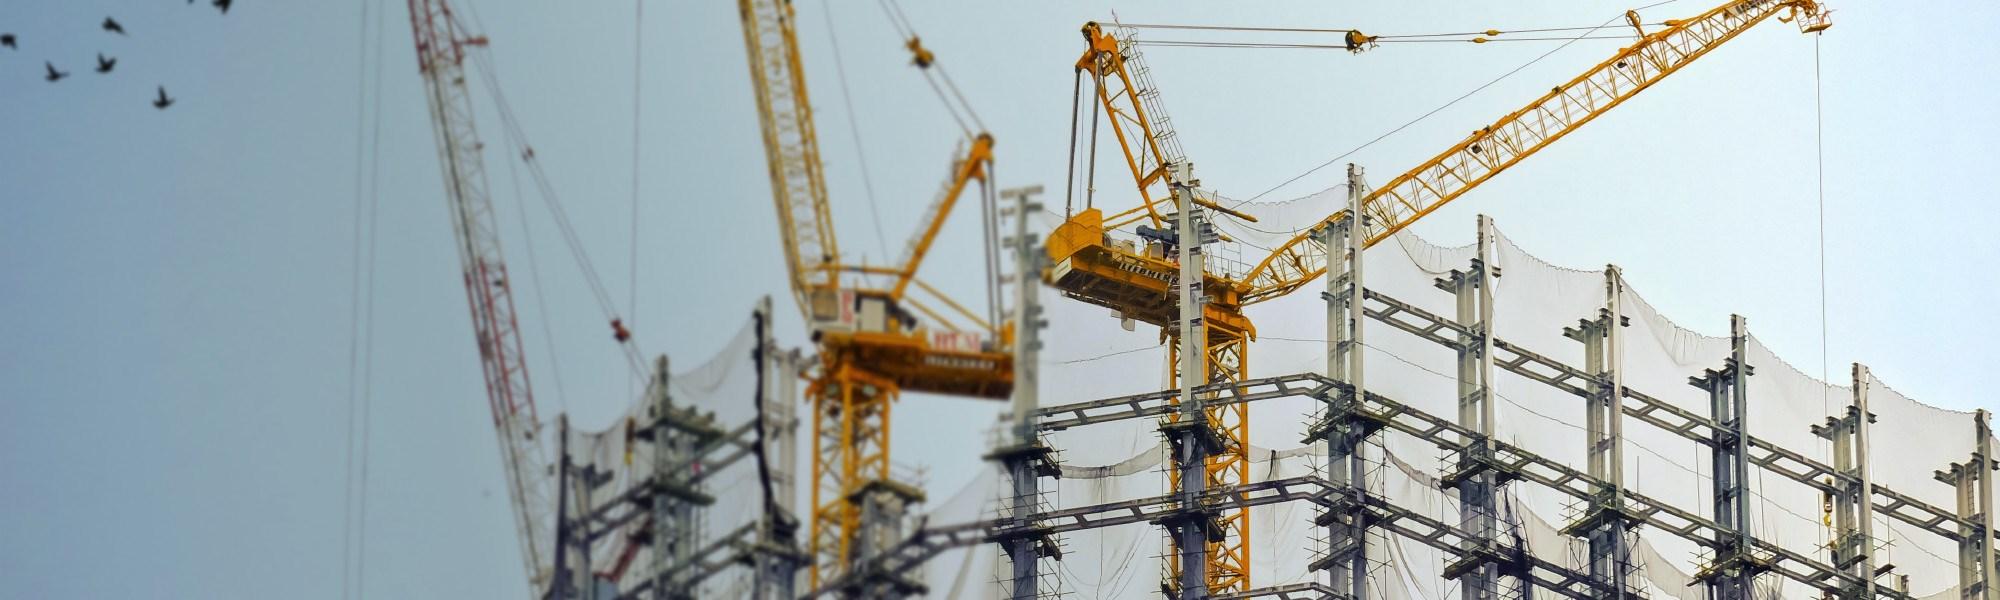 Certificate In Construction Management Uw Professional